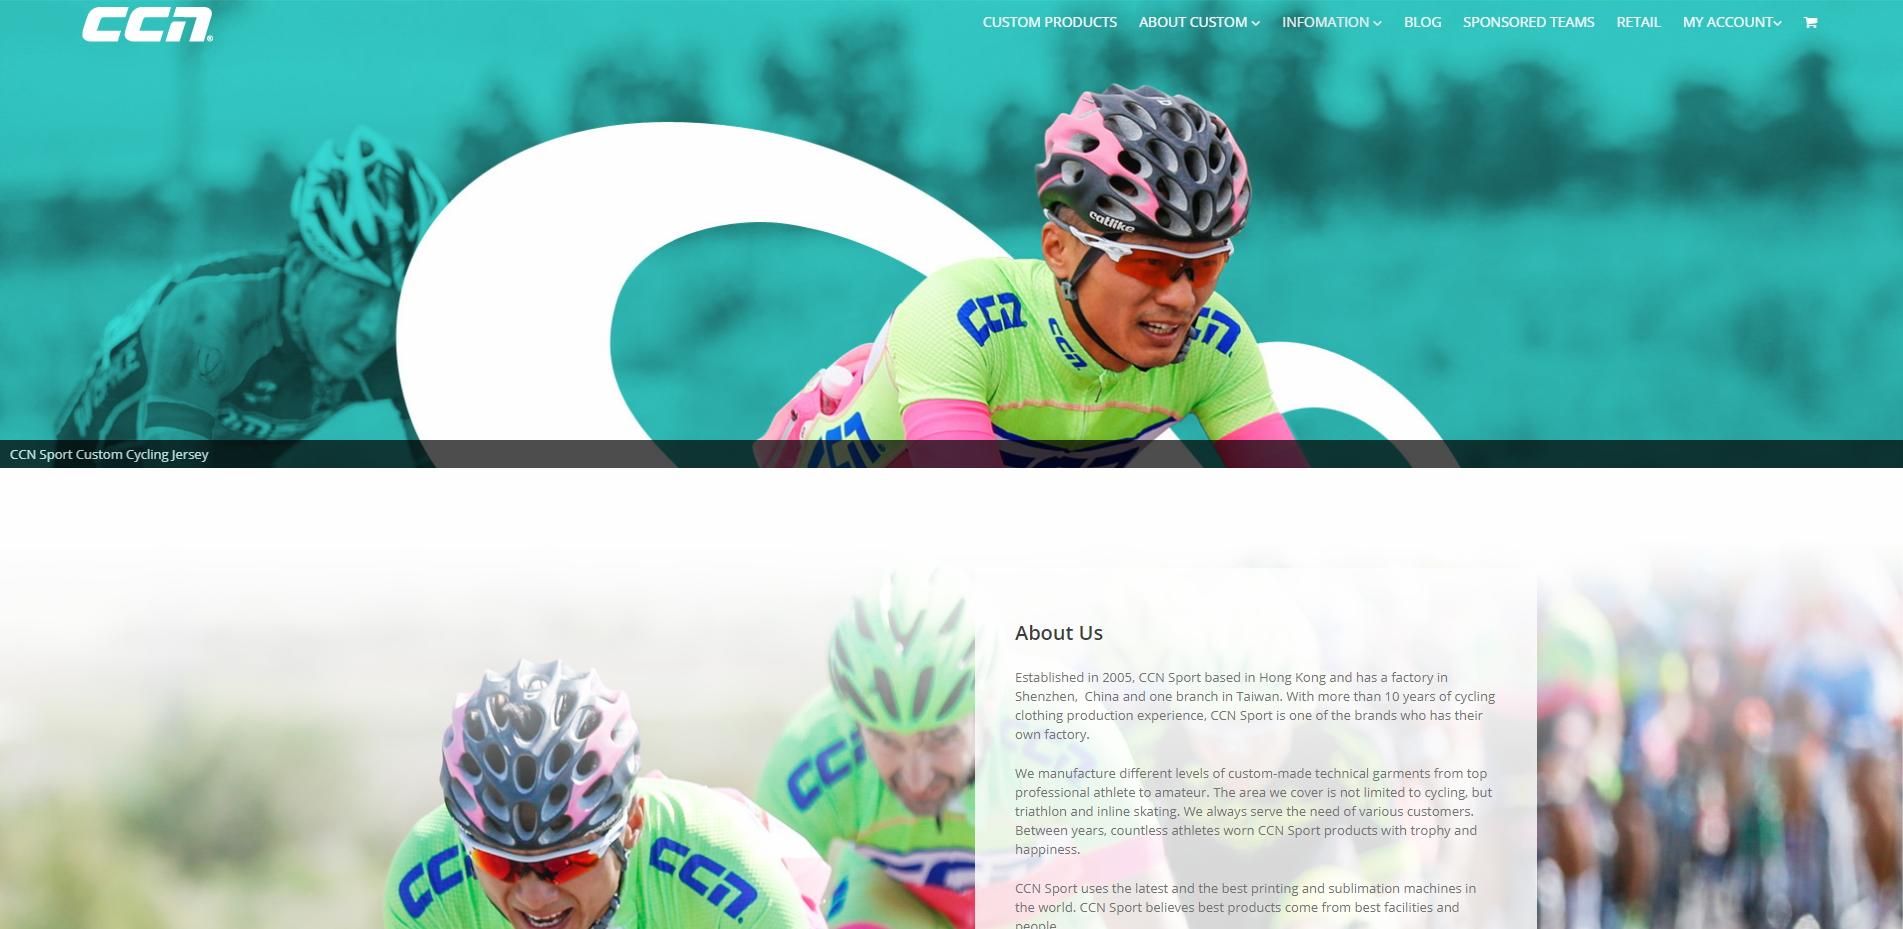 CCN Sport